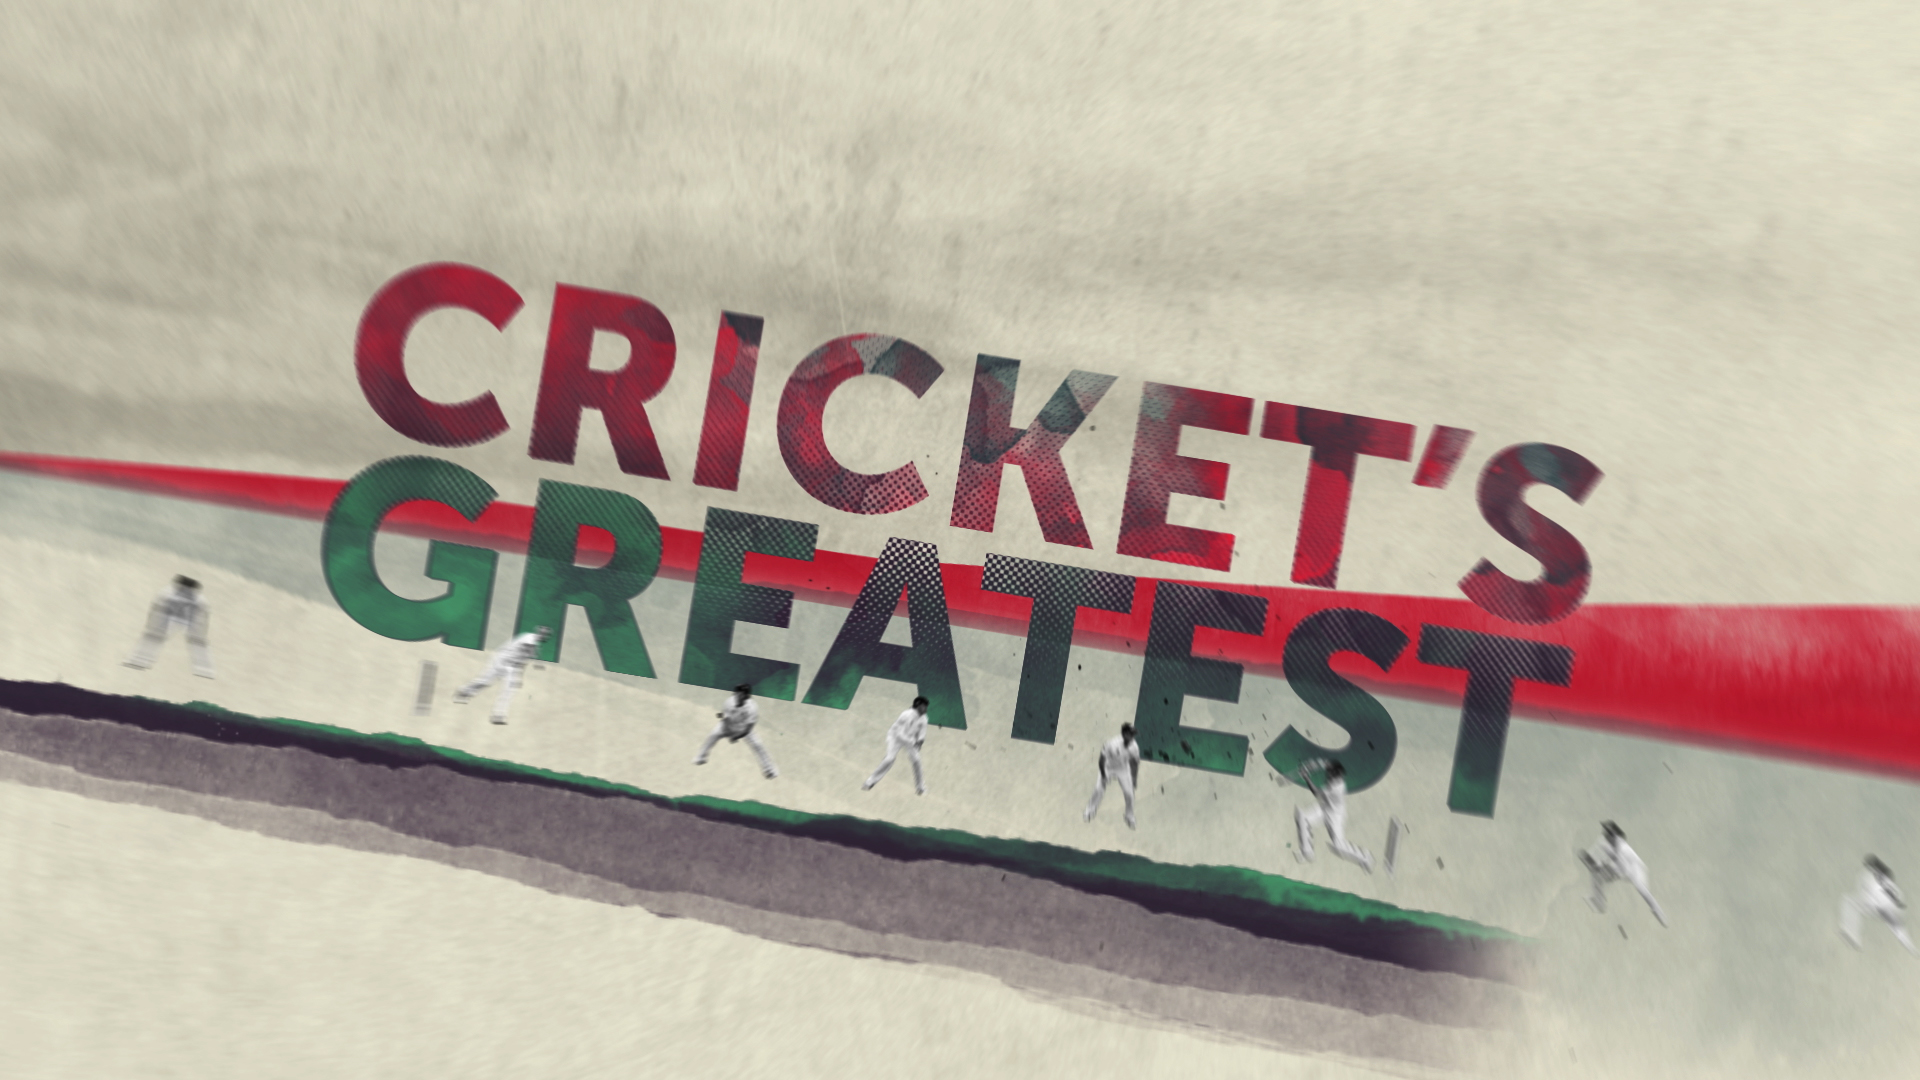 Crickets_Greatest_01.jpg